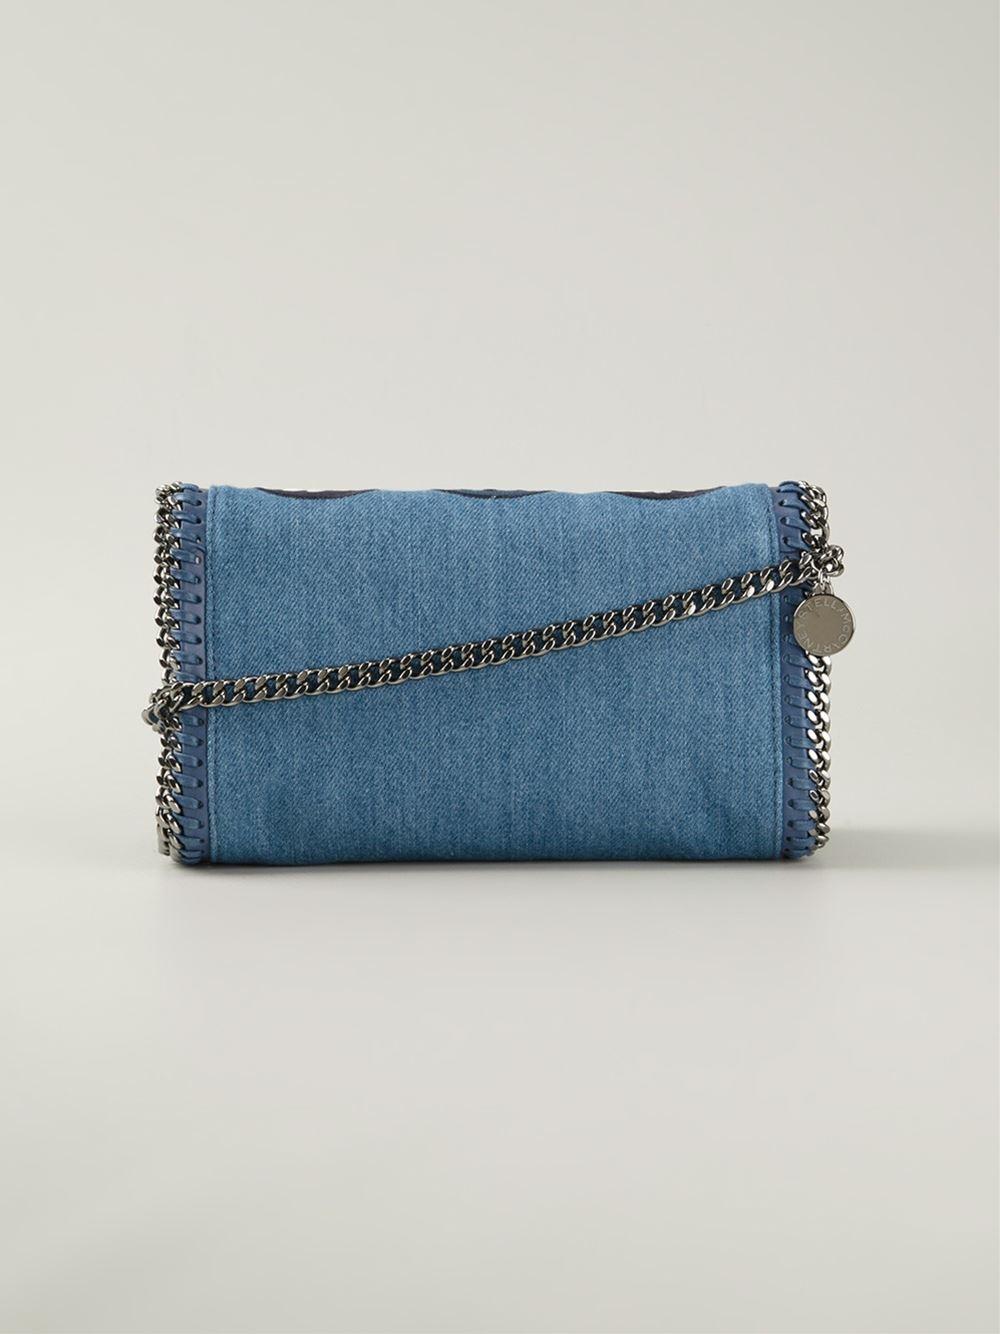 3140fc8a807d Lyst - Stella McCartney  Falabella Zigarette  Crossbody Bag in Blue